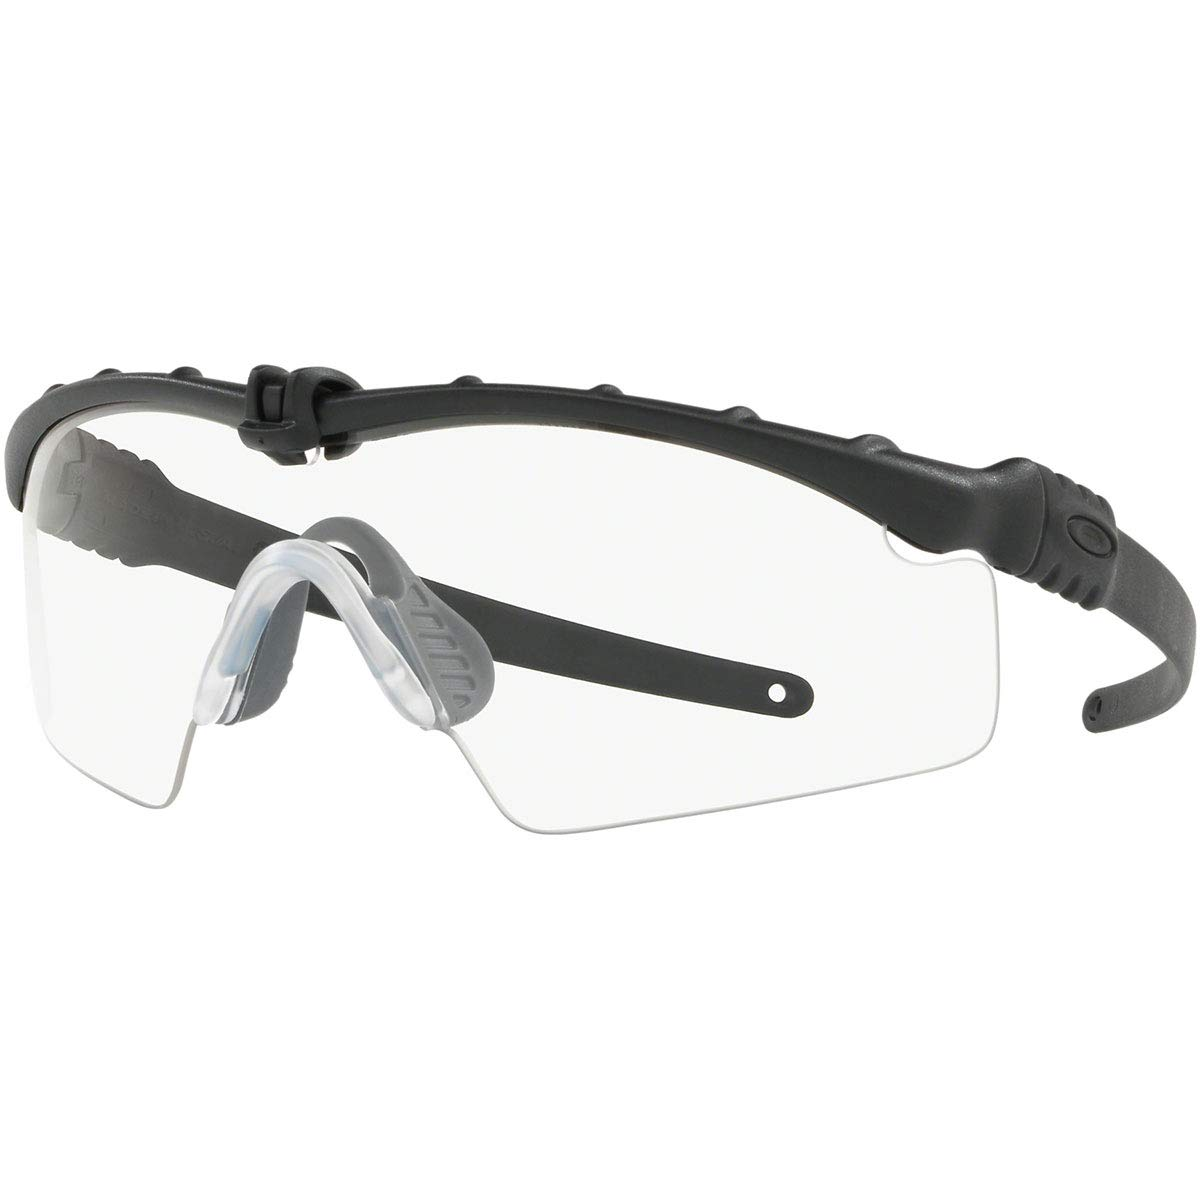 Oakley Men's Standard Issue M Frame 3.0 Sunglasses,OS,Matte Black/Clear